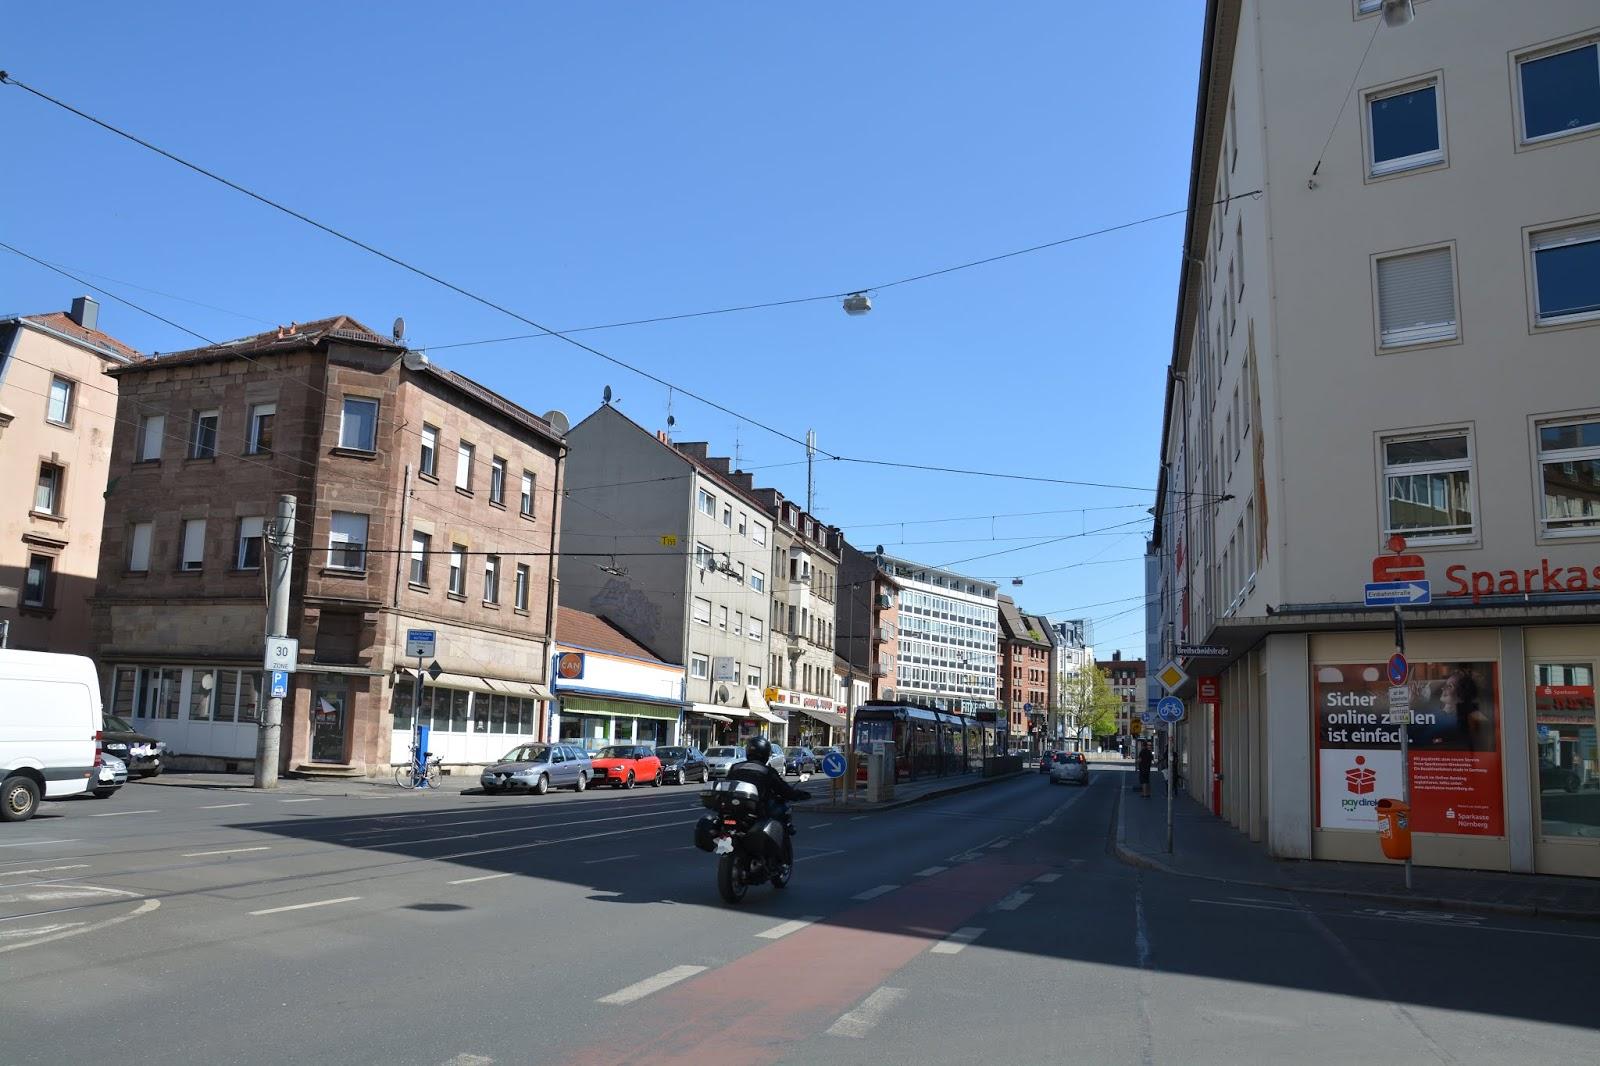 Allersberger Straße 130 Nürnberg